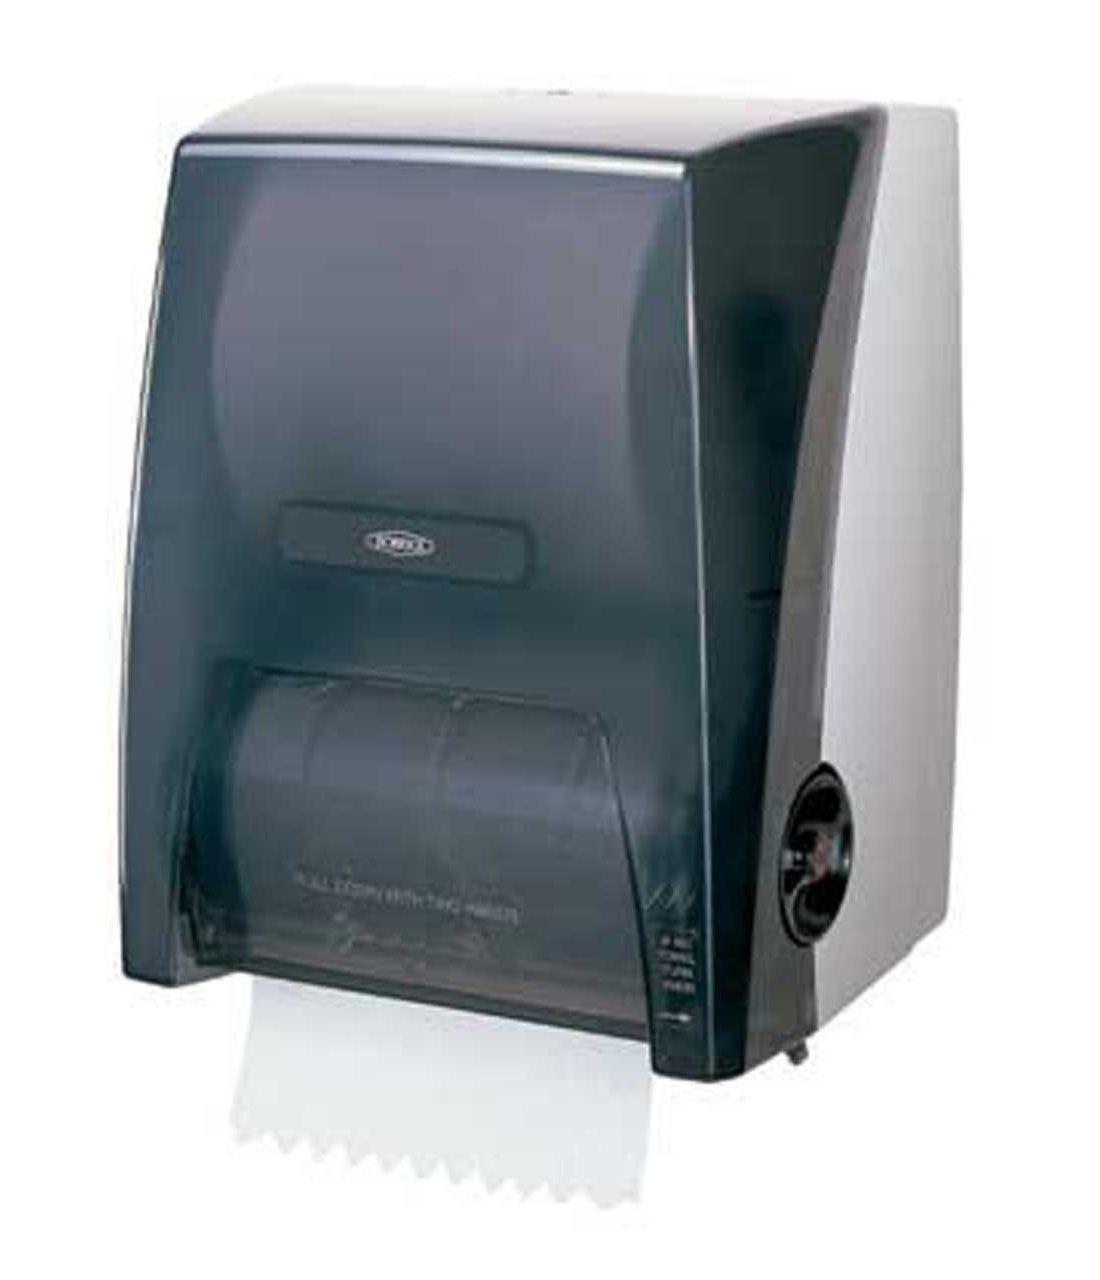 Automatic Paper Towel Dispenser For Bathroom